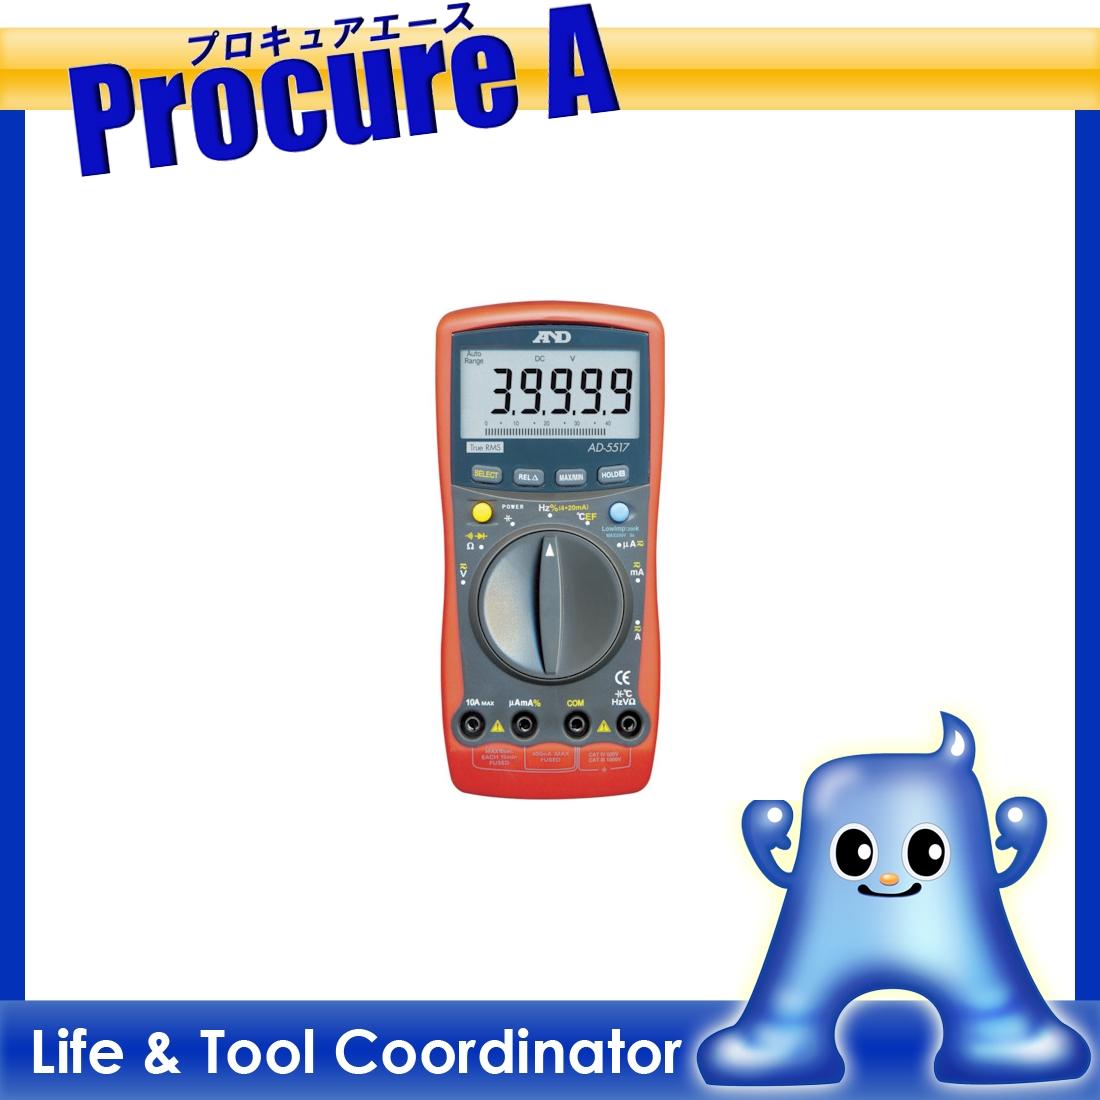 A&D デジタルマルチメーター高分解能、高機能形温度測定 AD5517 ▼320-9954 (株)エー・アンド・デイ